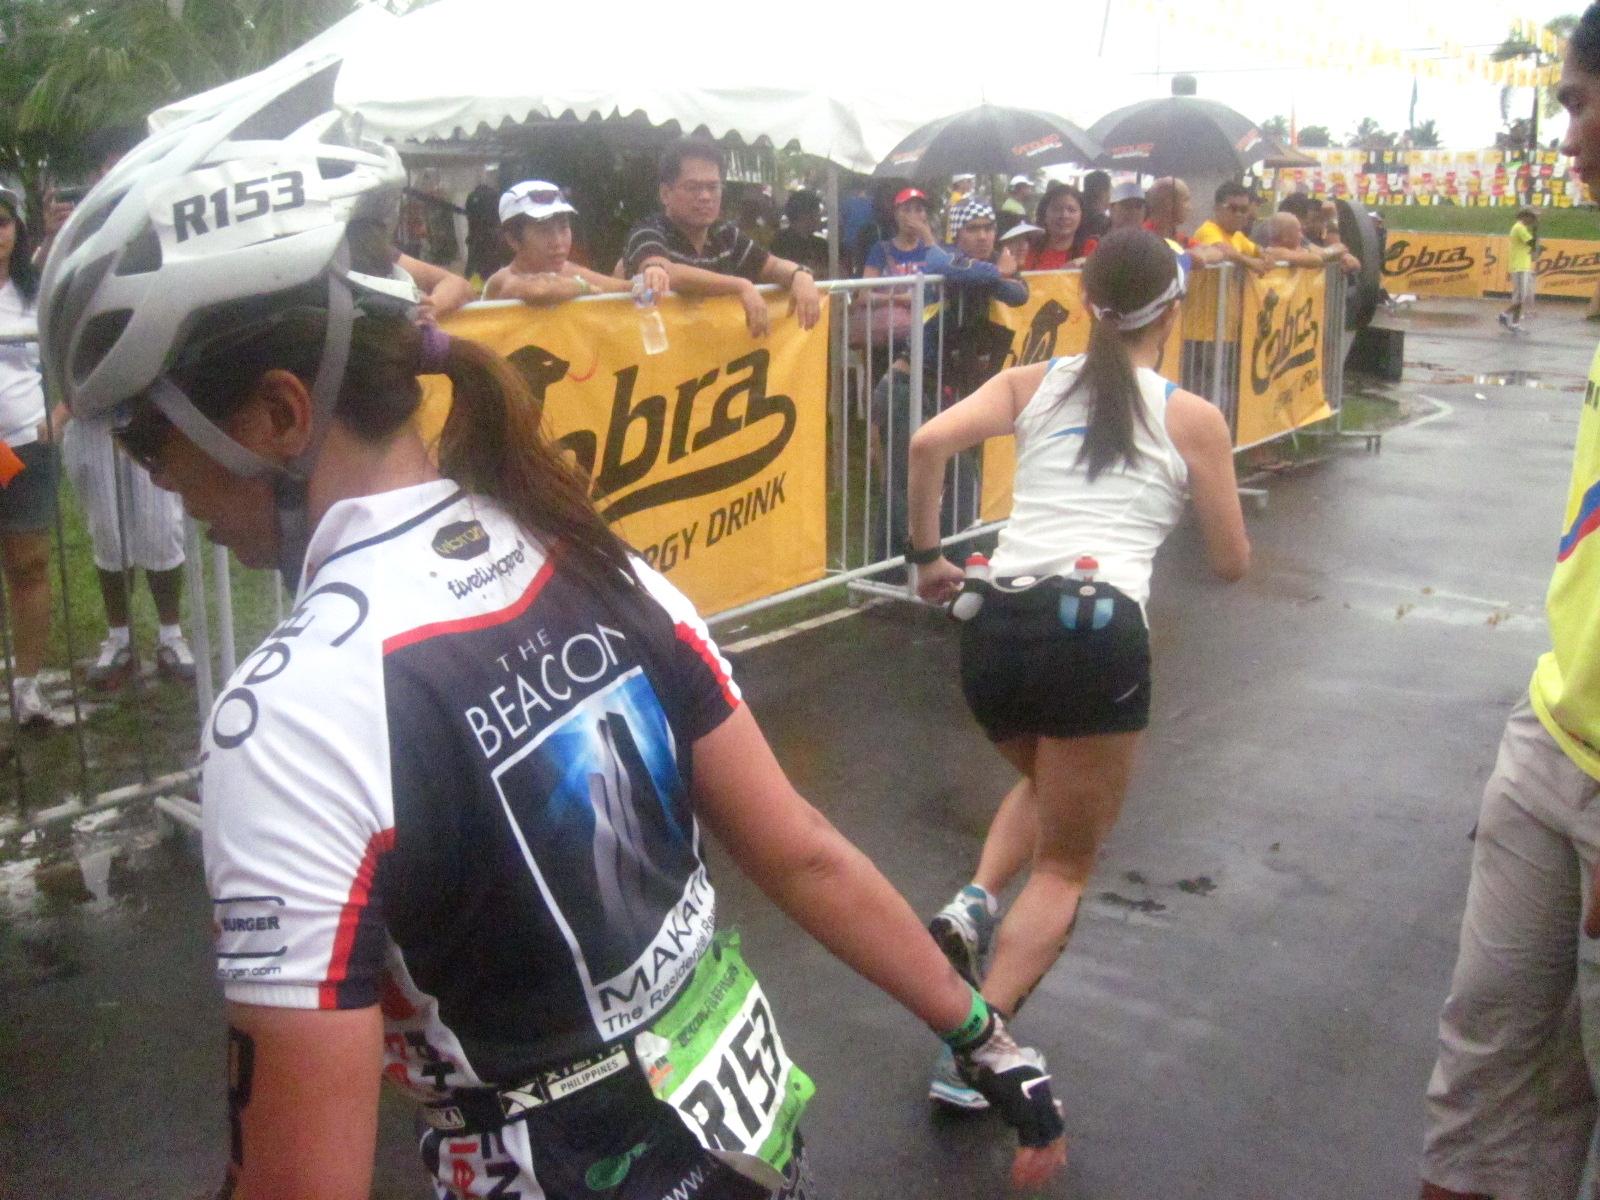 2011 Ironman 70.3: Relay Handoff